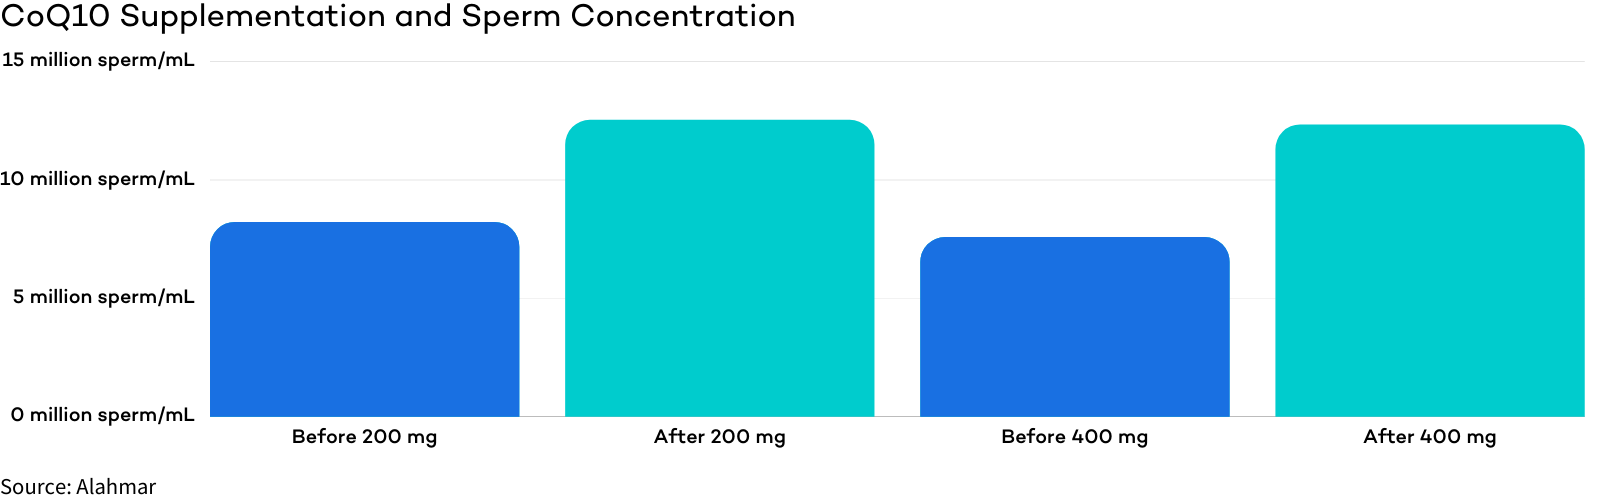 CoQ10 - Male Fertility Supplement for Sperm Count